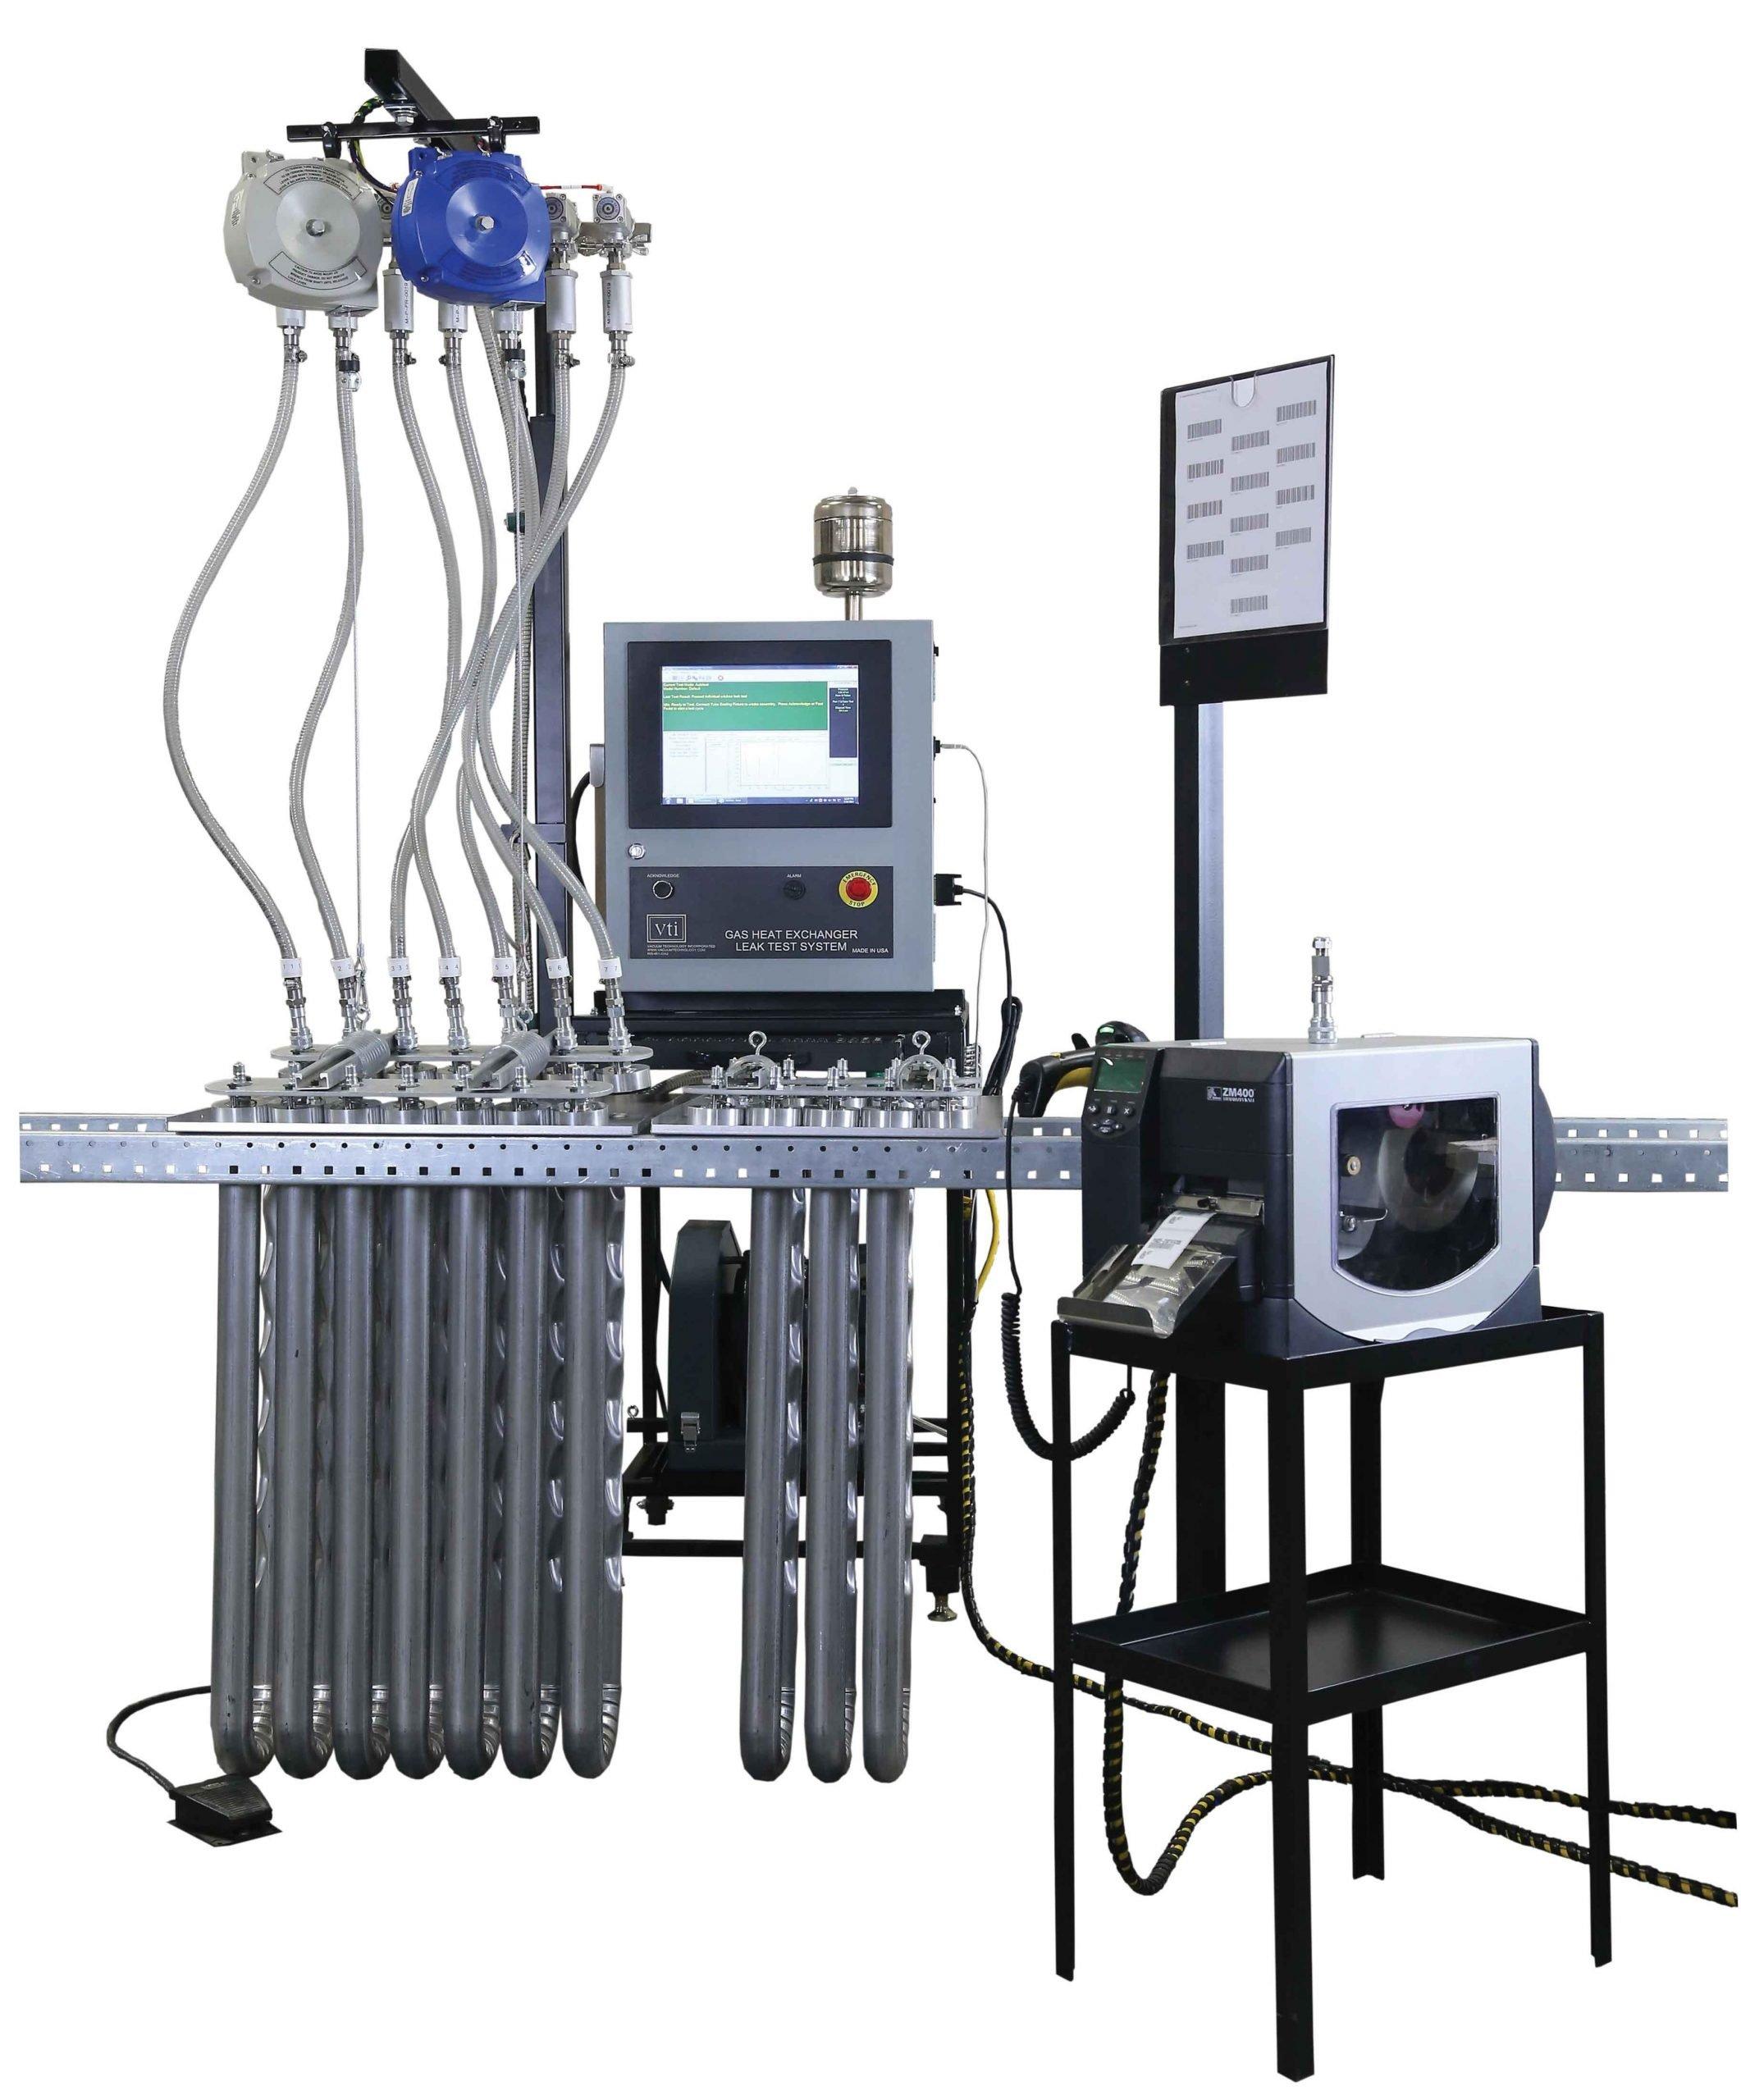 VTI's Gas Heat Exchanger Leak Test System for Heat Exchanger Manufacturing